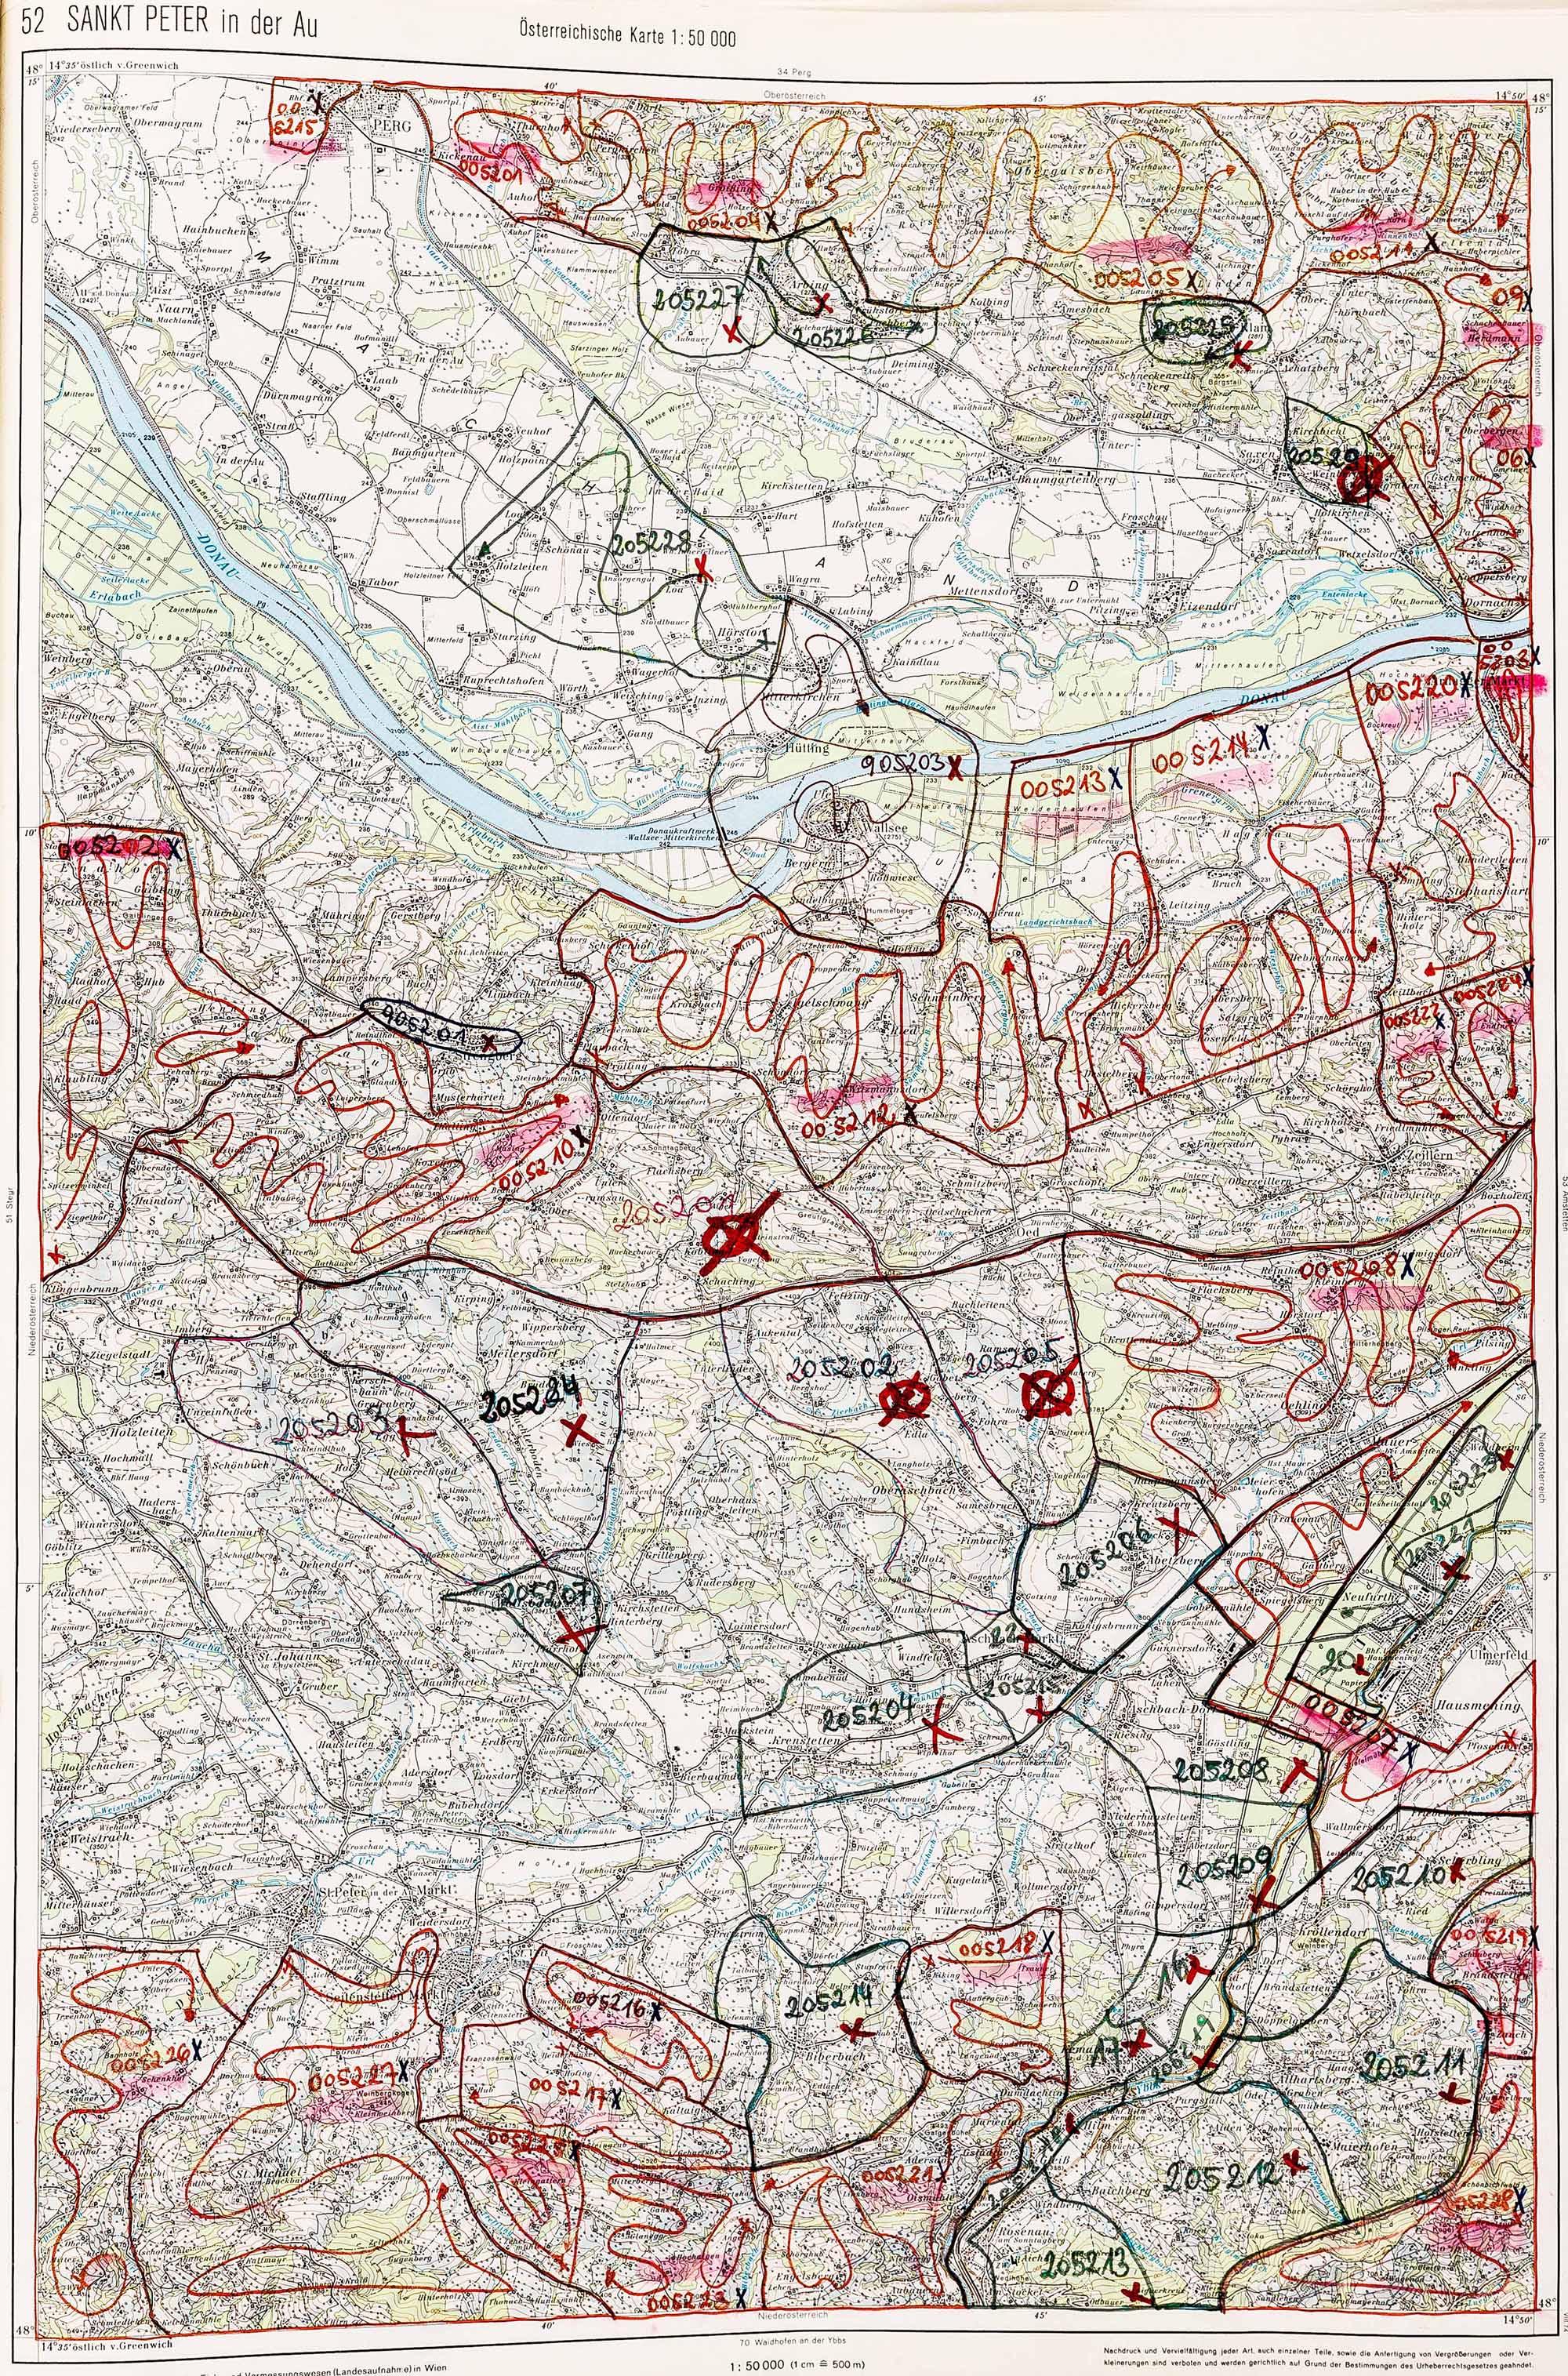 1979-1982 Karte 052